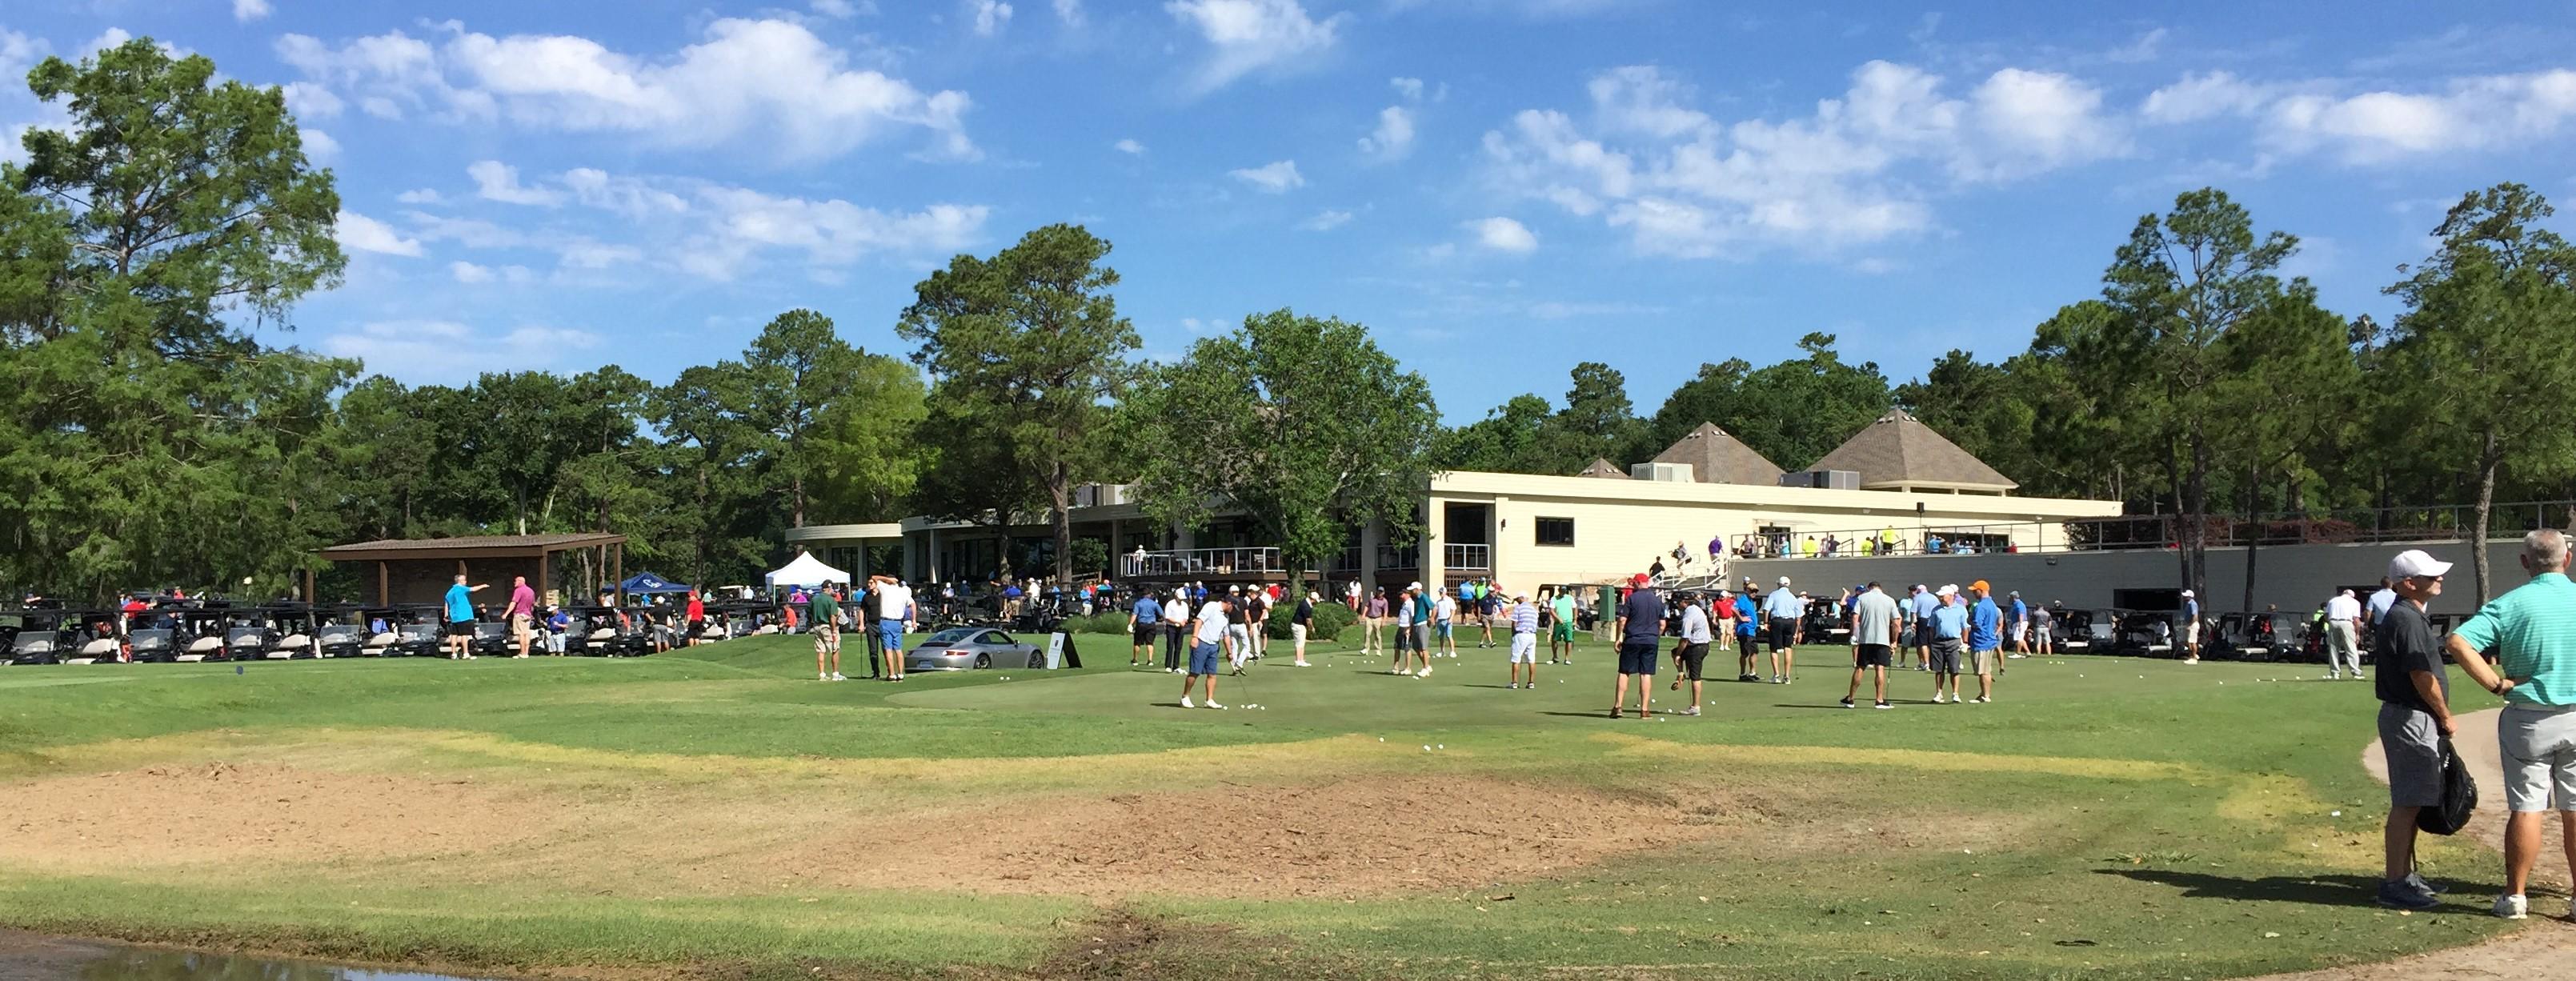 Golf Tourney Photo